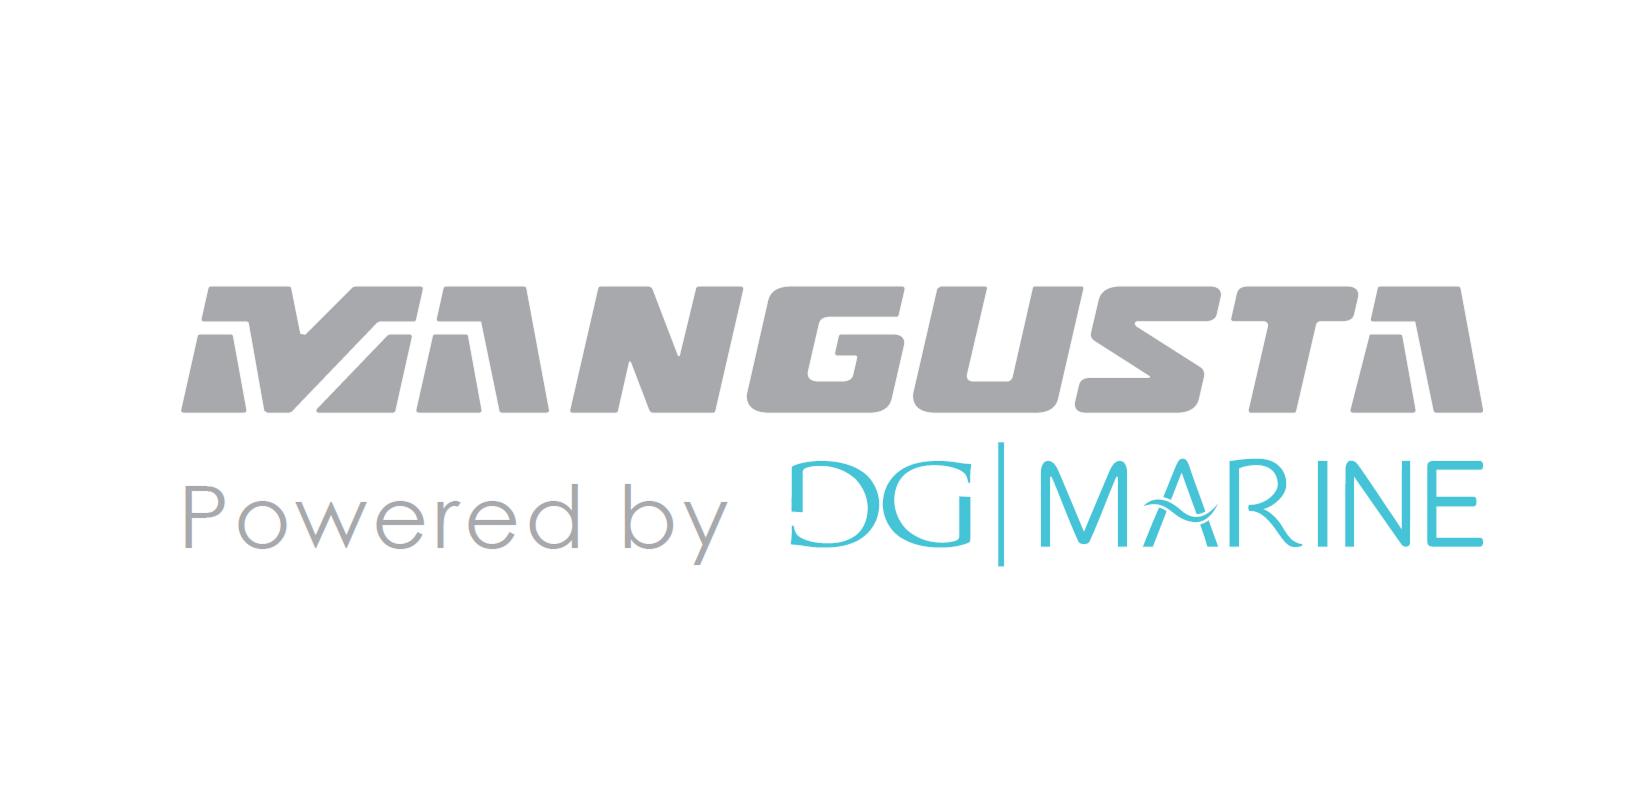 DG Marine Trading LLC